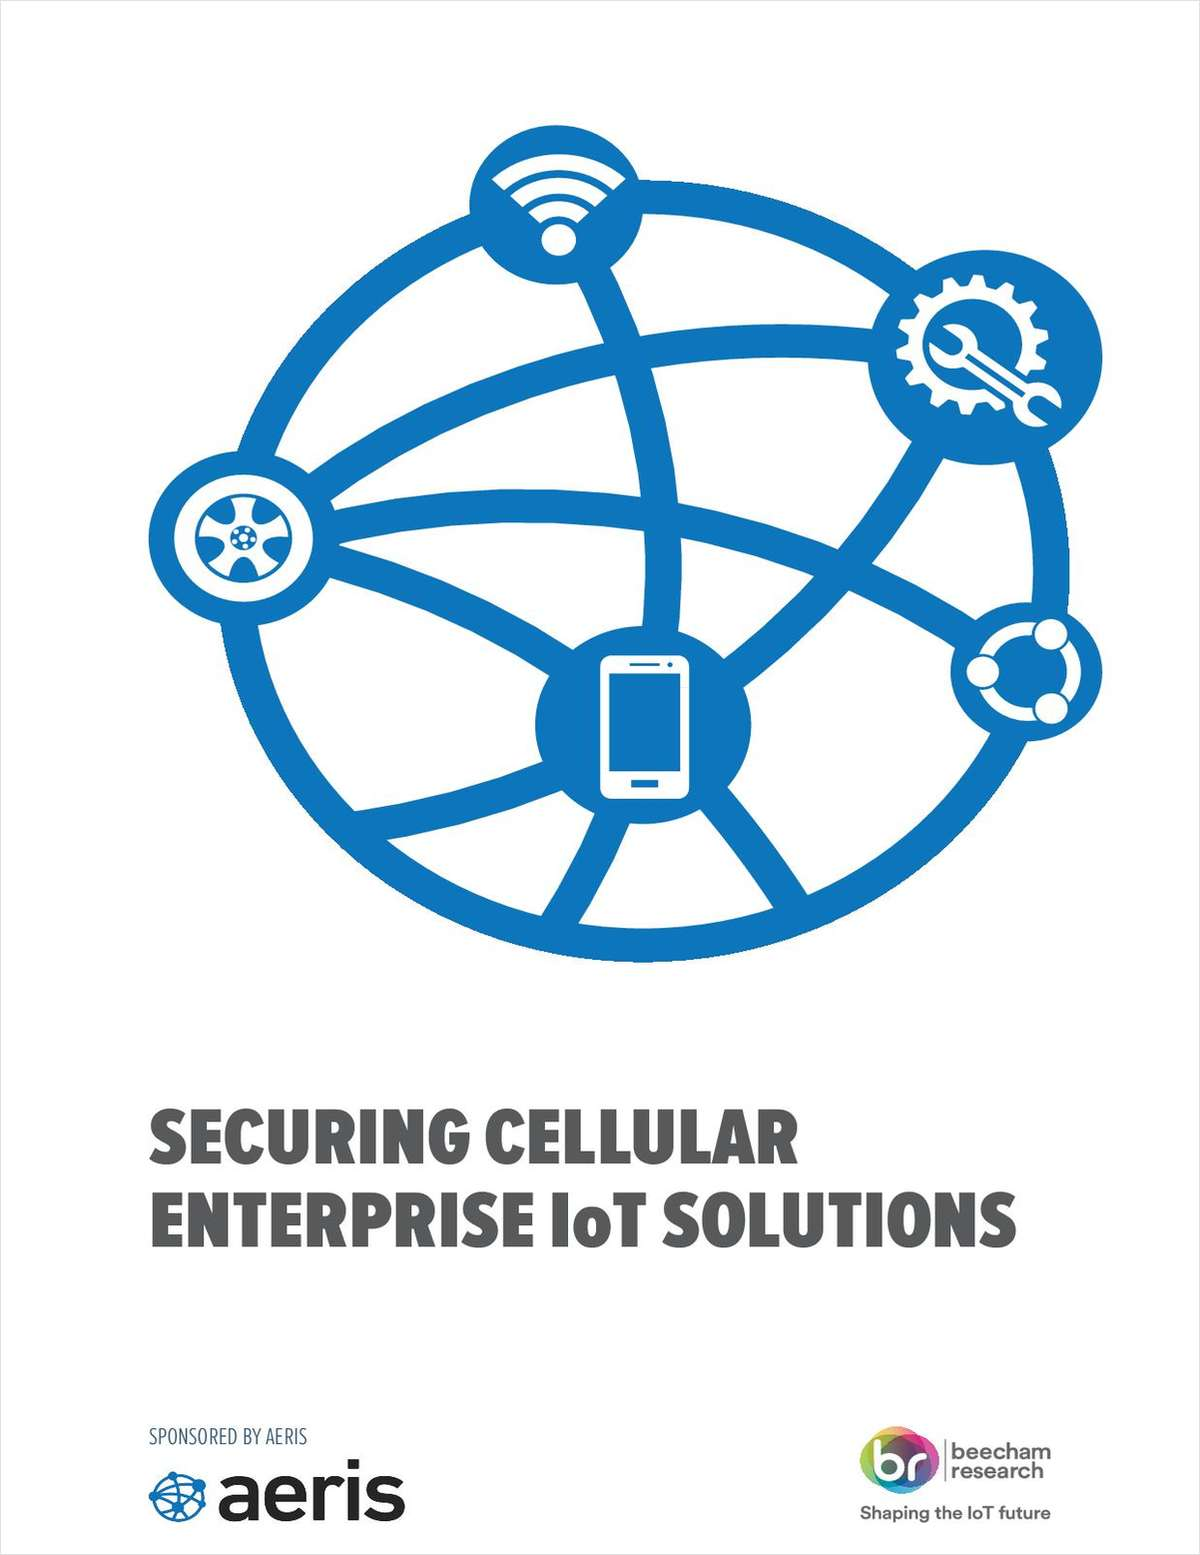 Securing Cellular Enterprise IoT Solutions